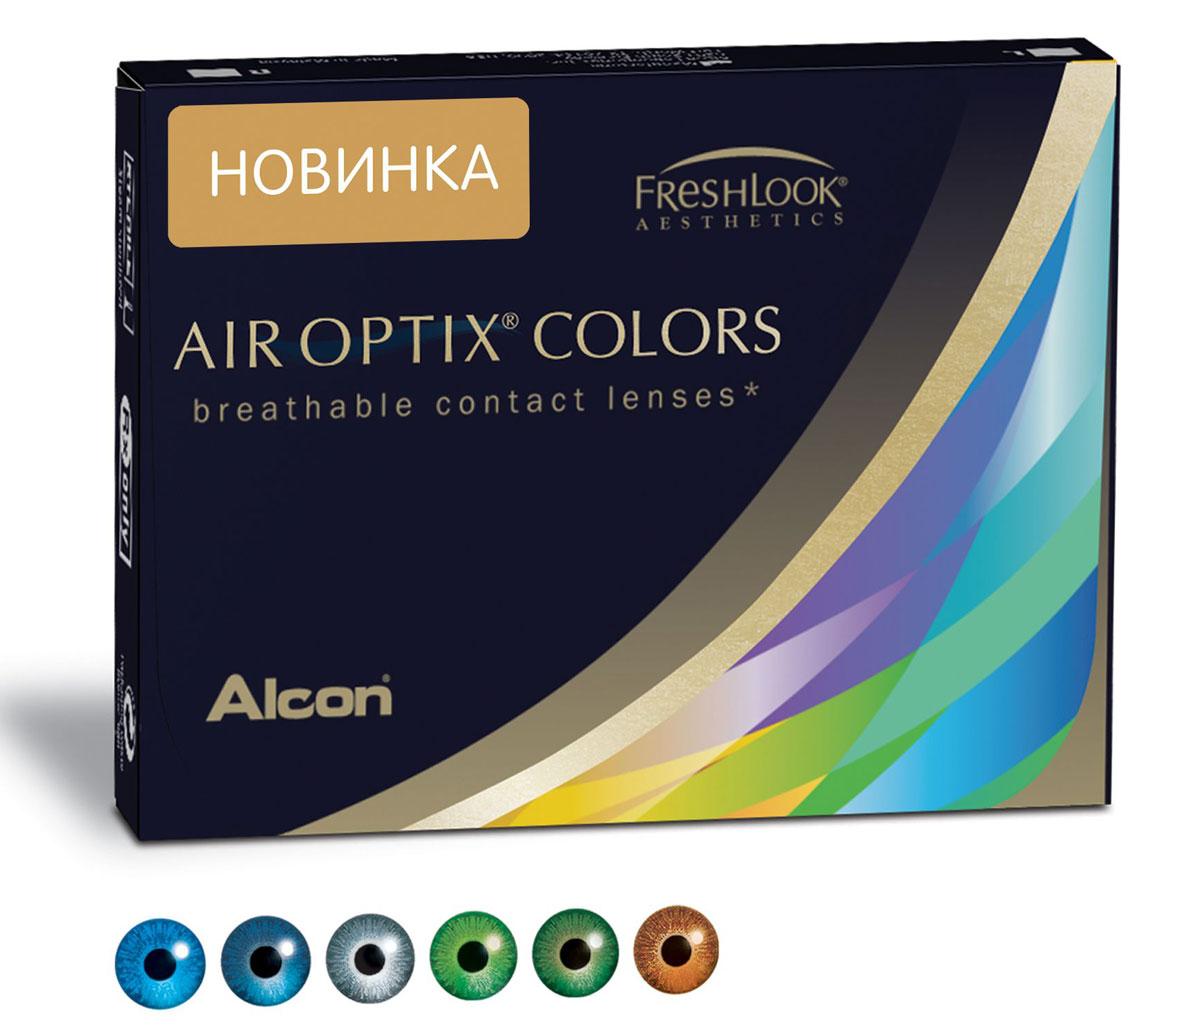 Аlcon контактные линзы Air Optix Colors 2 шт -2.25 Green